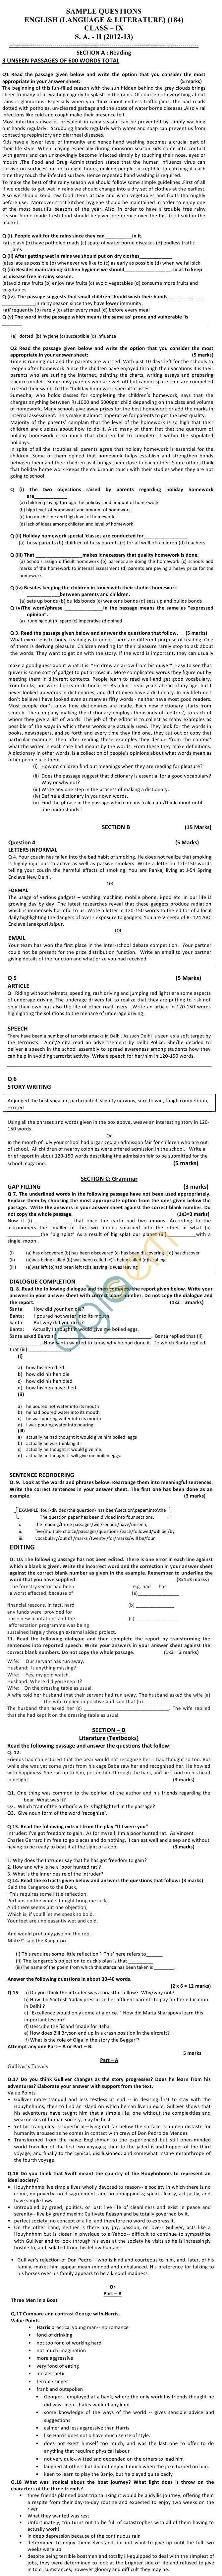 Cbse Board Exam Sample Papers Sa Class Ix  English Lang  Lit